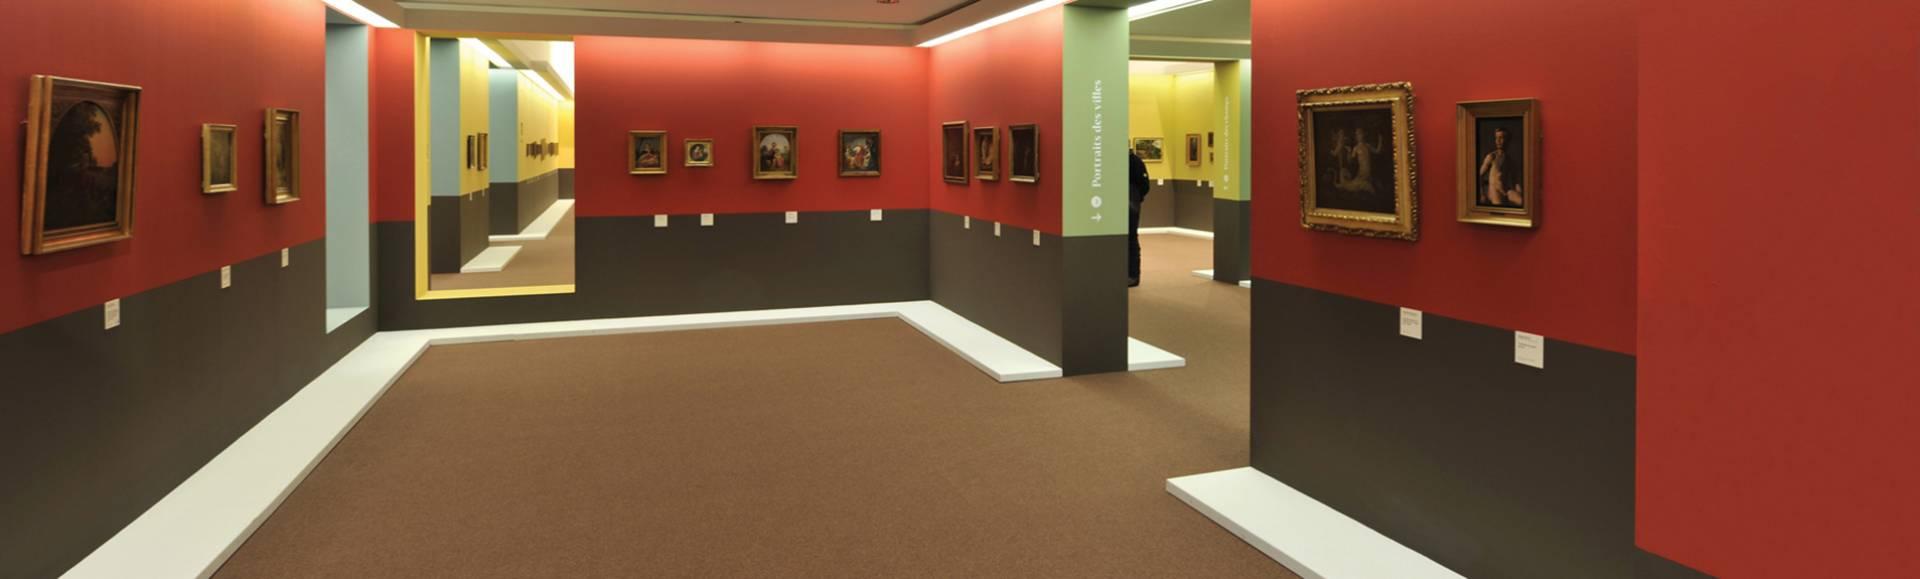 La Piscine Exposition Peinture Danoise Roubaix Balsan Fr